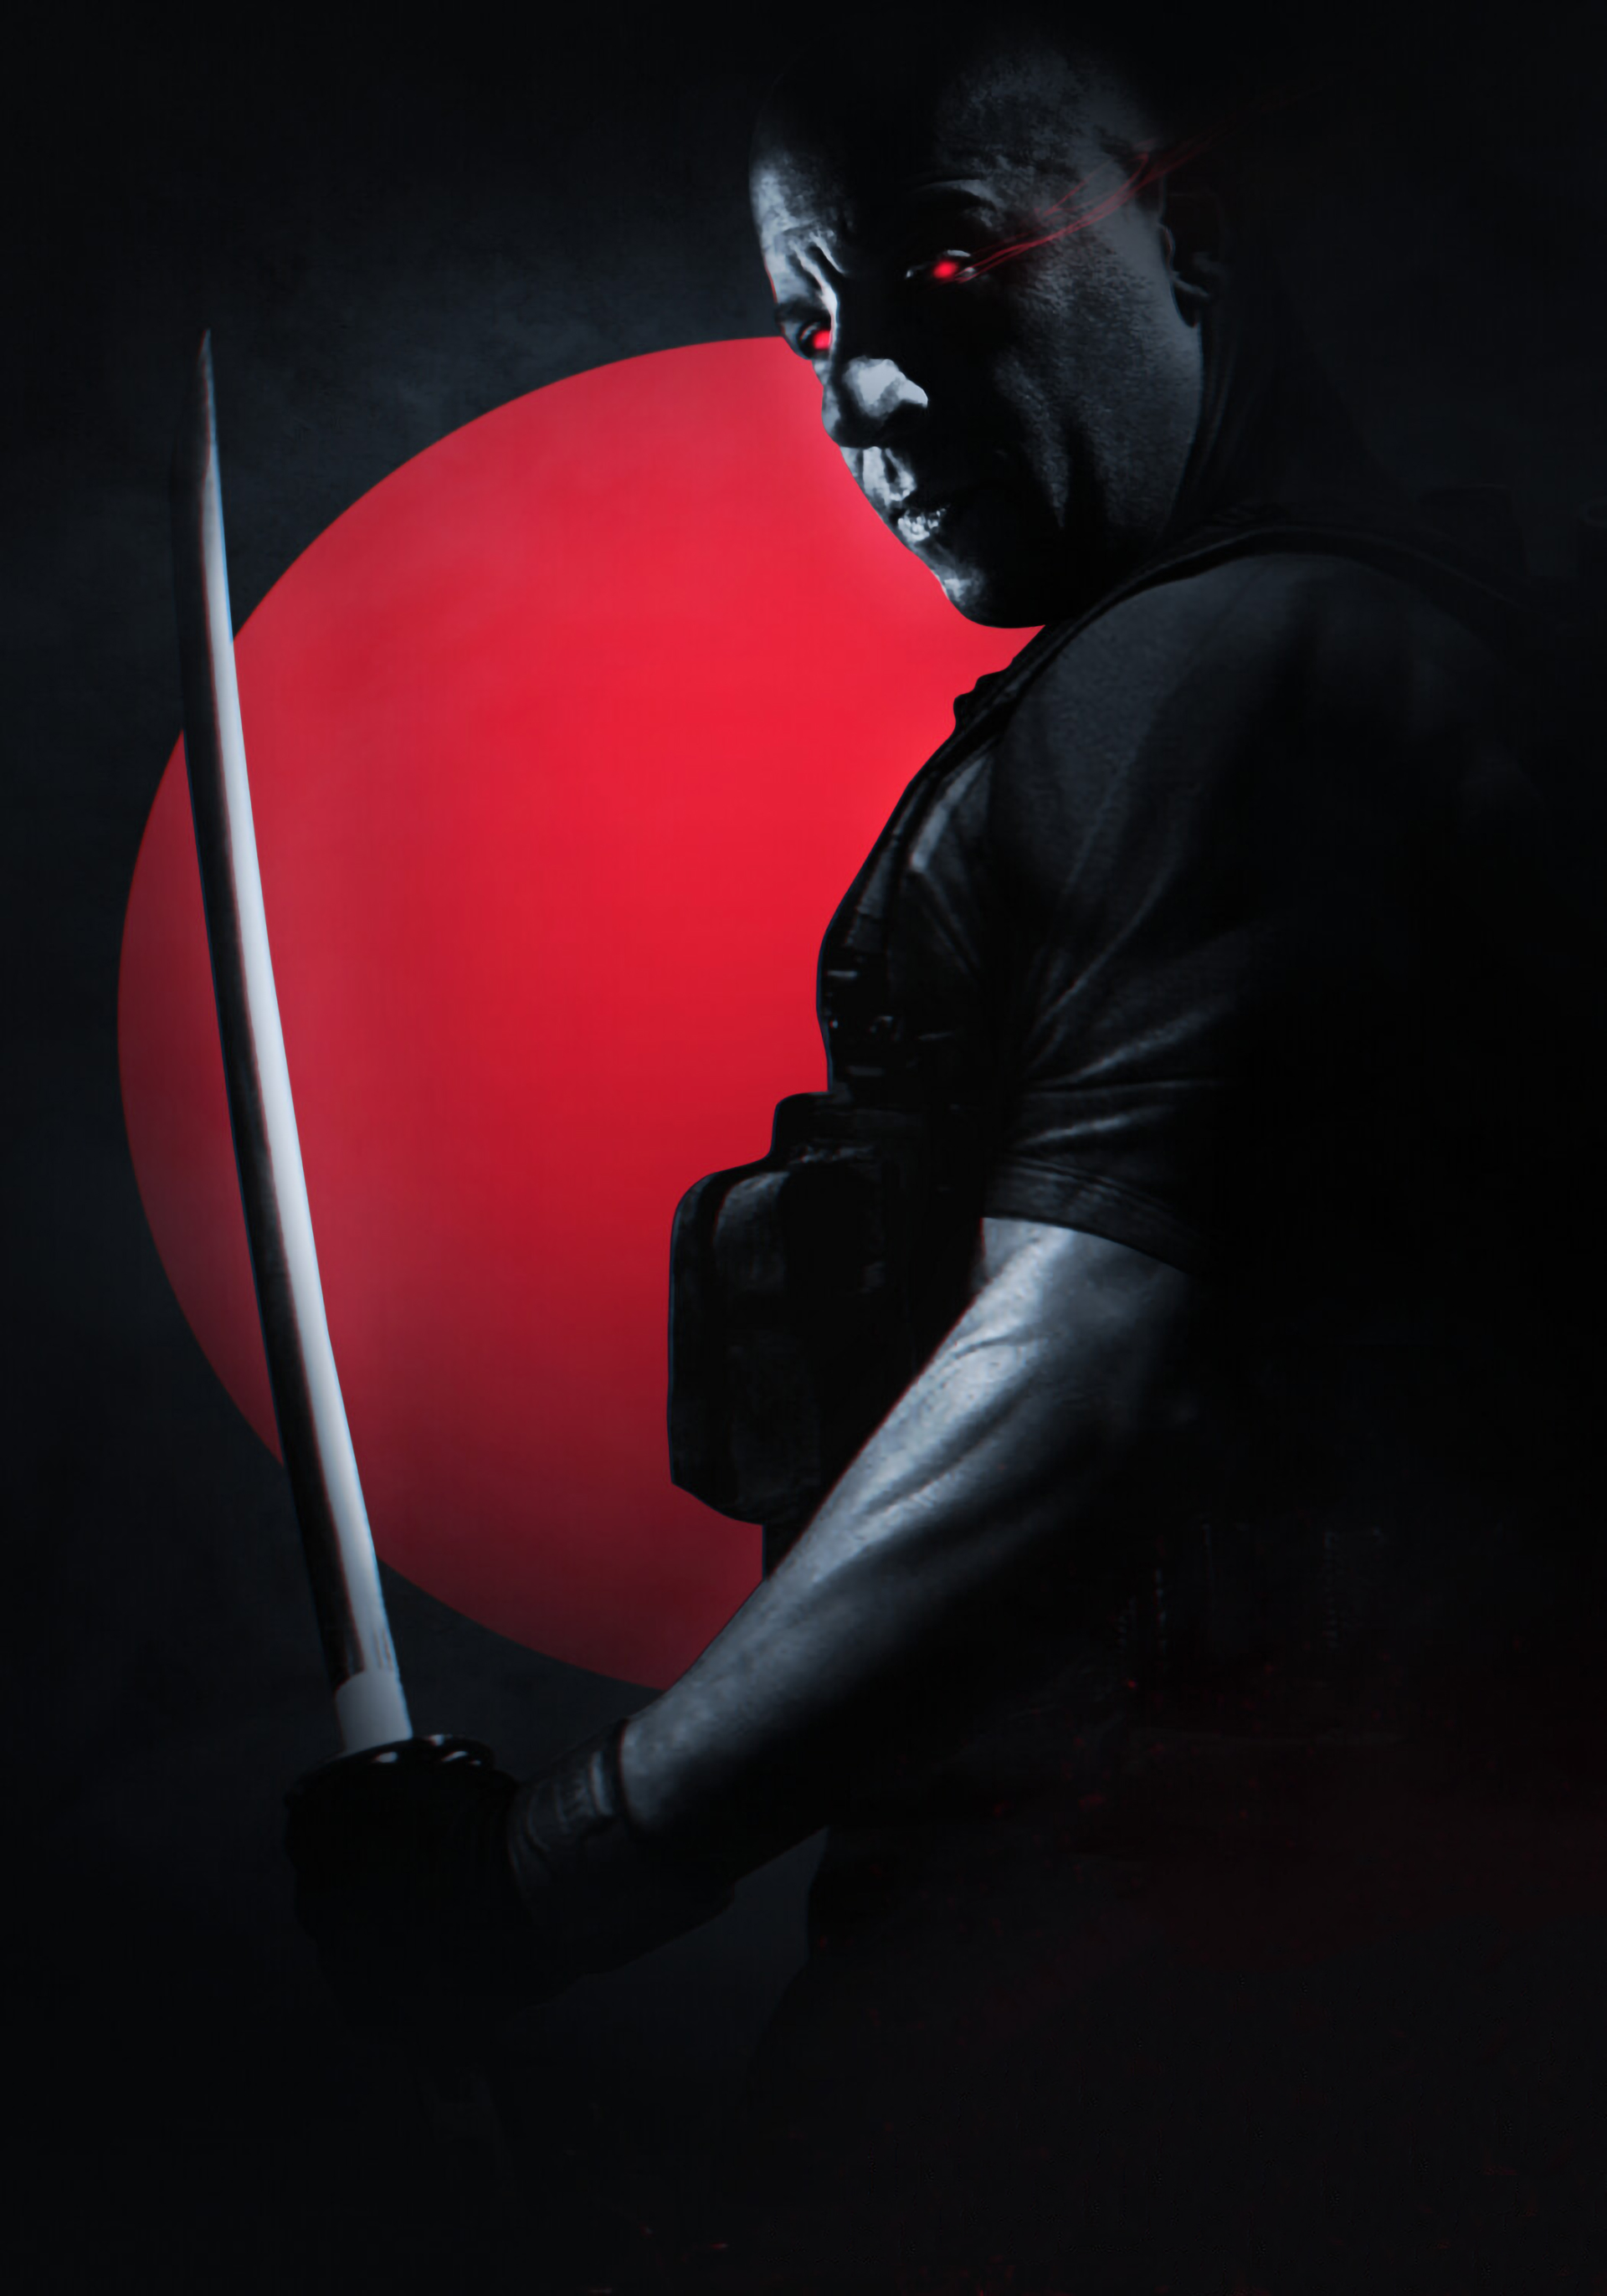 Vin Diesel Bloodshot Movie 2020 Wallpaper, HD Movies 4K ...